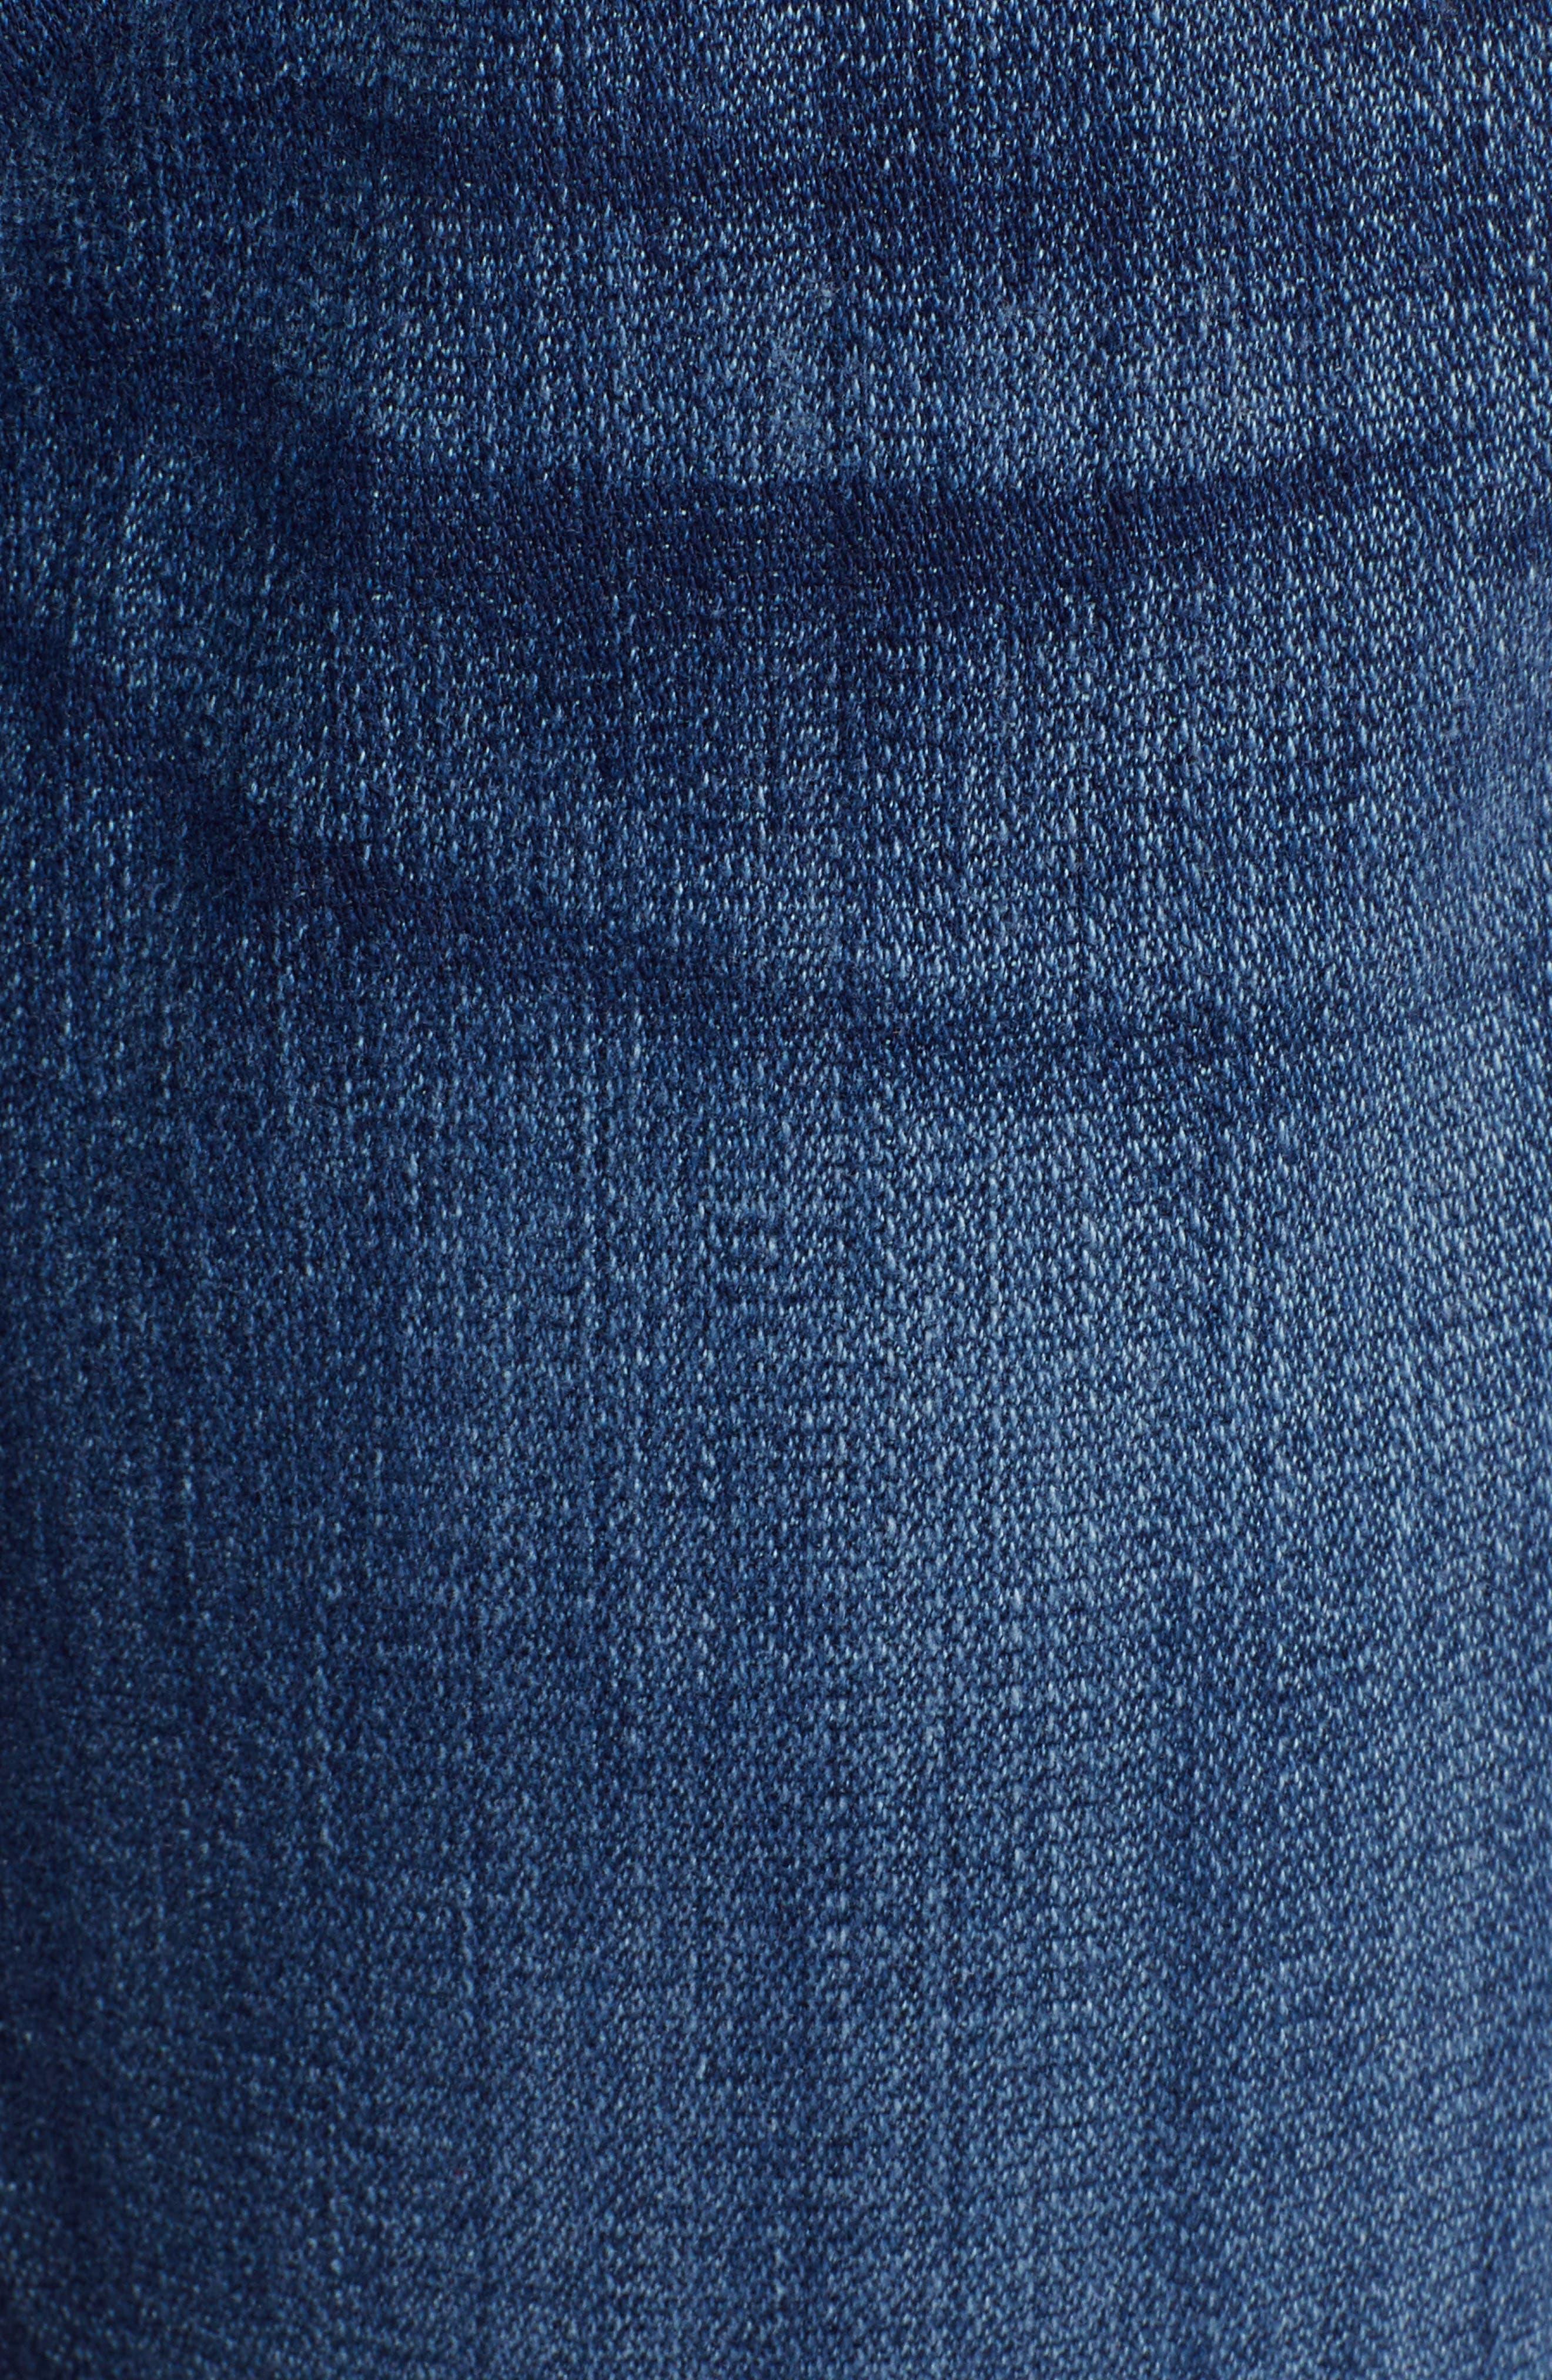 7 FOR ALL MANKIND<SUP>®</SUP>, Josefina Boyfriend Jeans, Alternate thumbnail 6, color, BROKEN TWILL VANITY W/ DESTROY